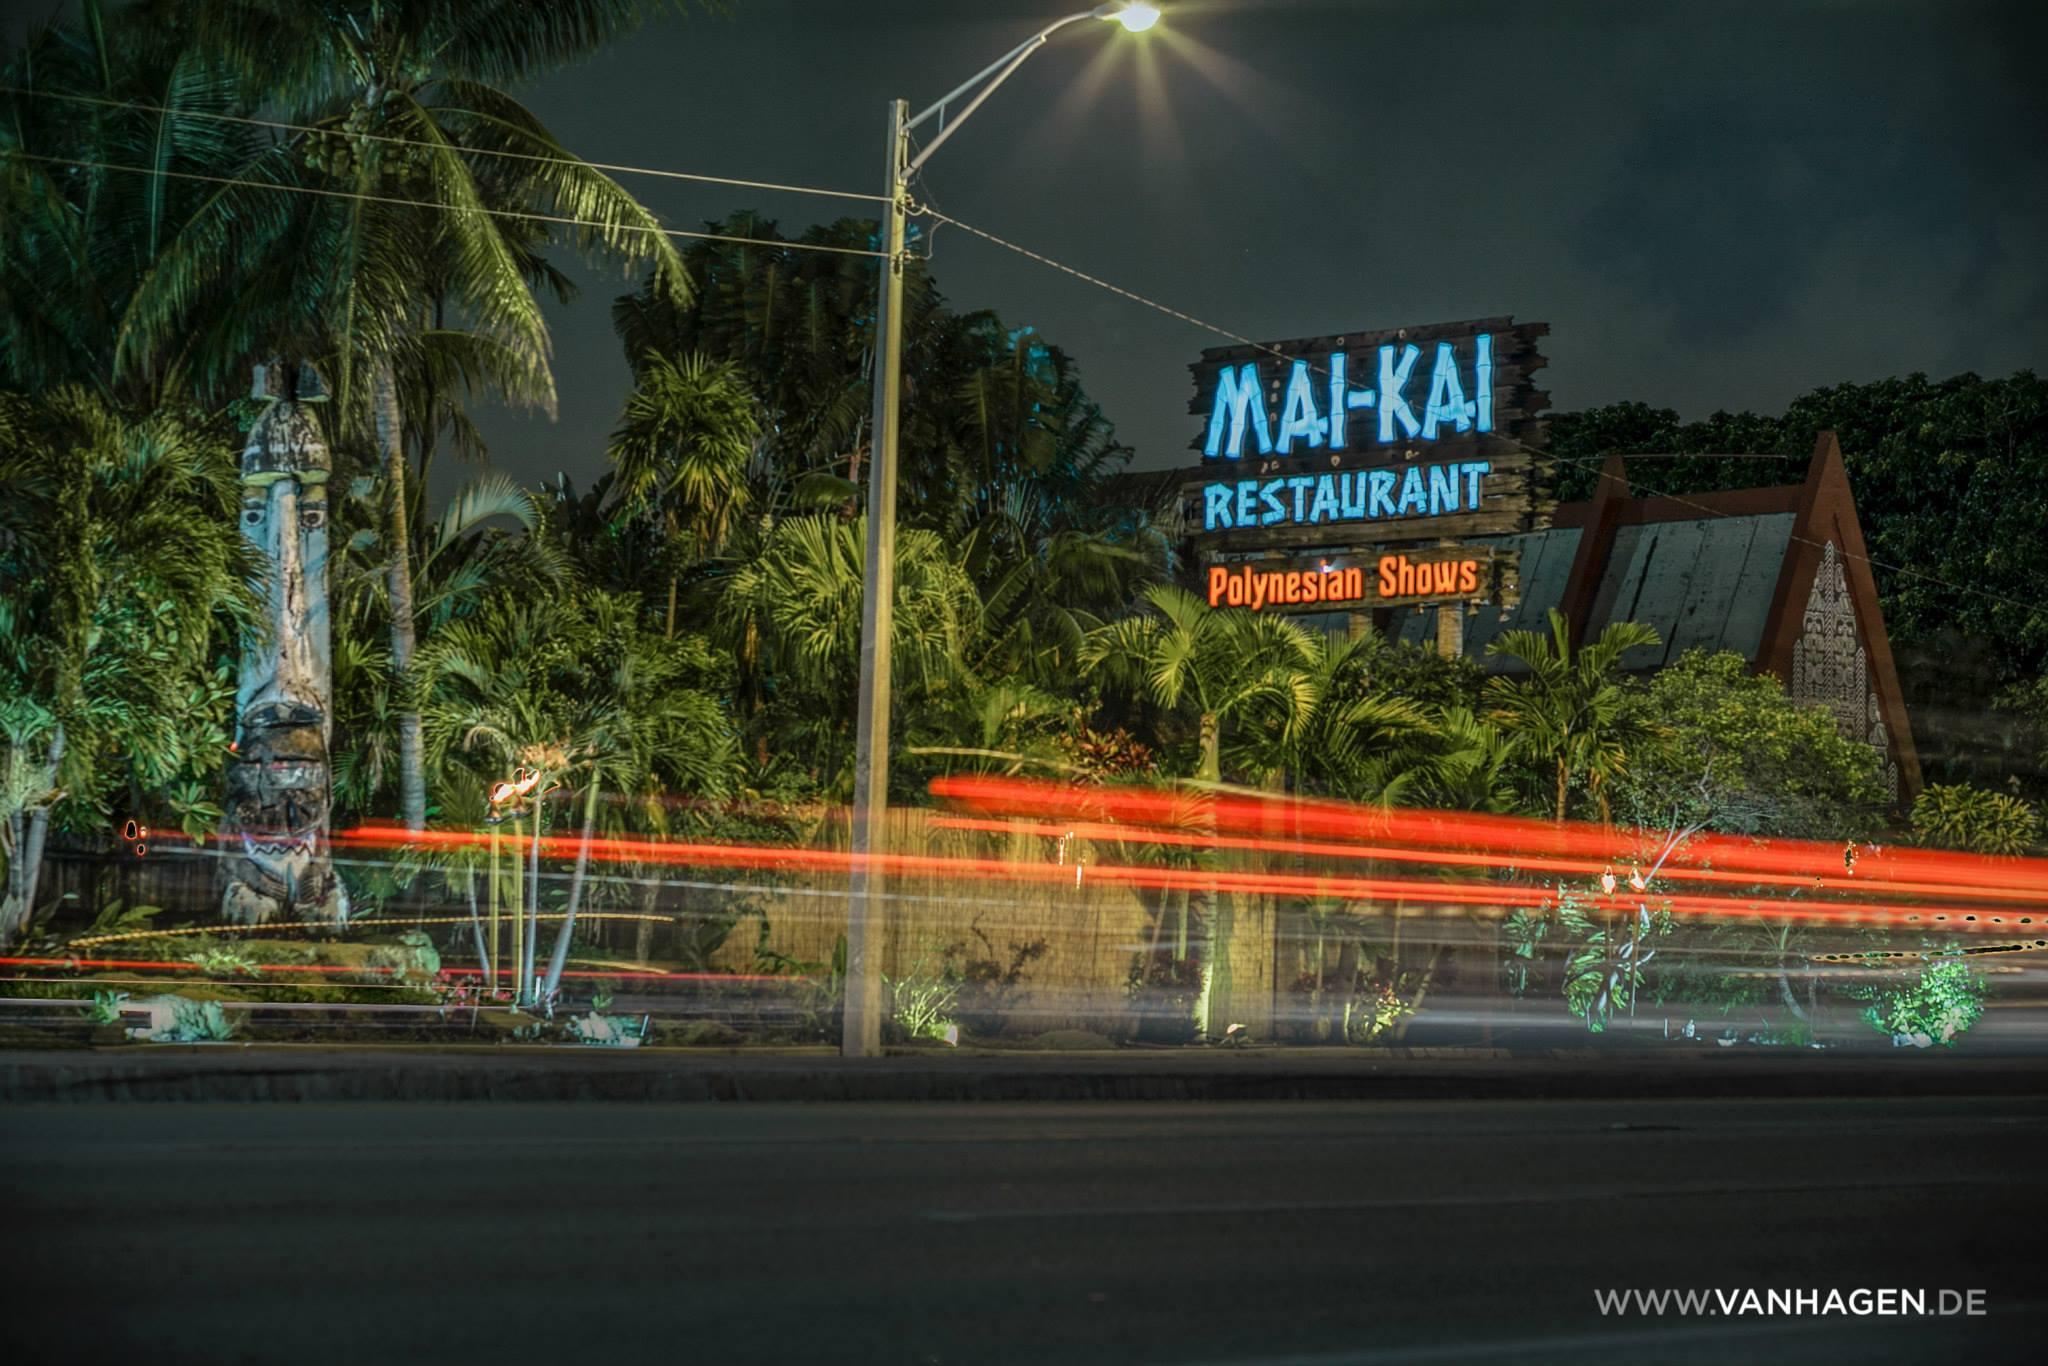 Mai-Kai sign